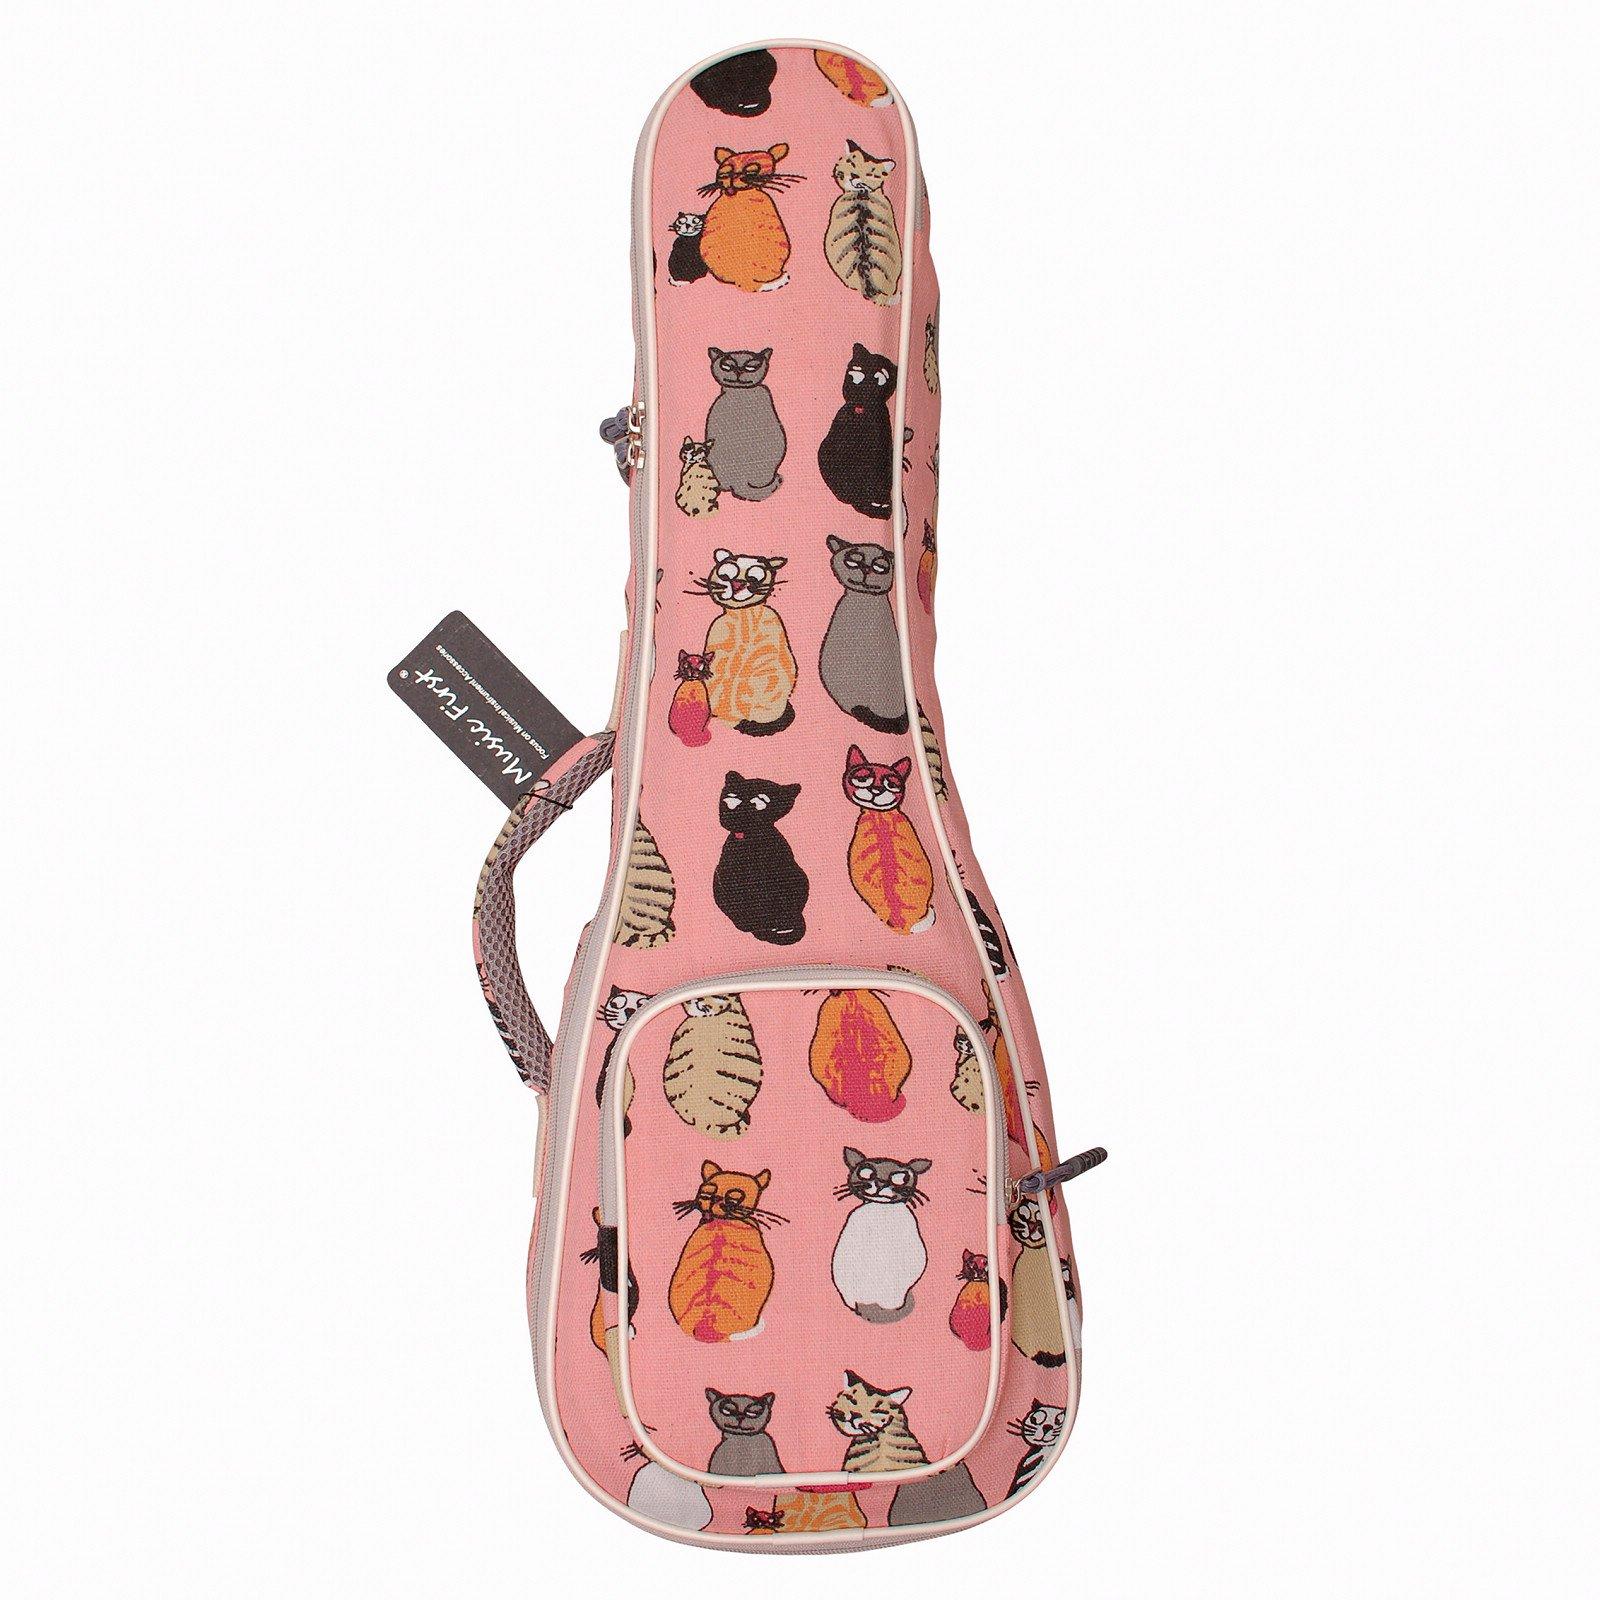 MUSIC FIRST cotton 21'' Soprano''MISS CAT'' ukulele case ukulele bag ukulele cover, New Arrial, Original Design, Best Christmas Gift! by MUSIC FIRST